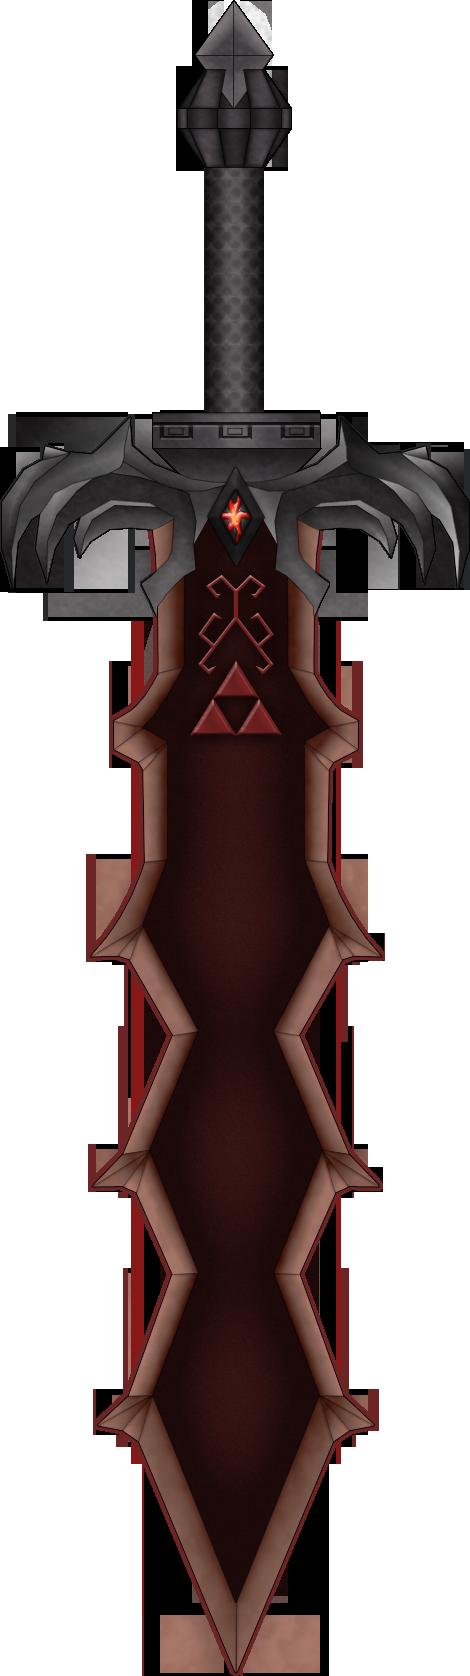 Demise's Sword 01112012 by BLUEamnesiac